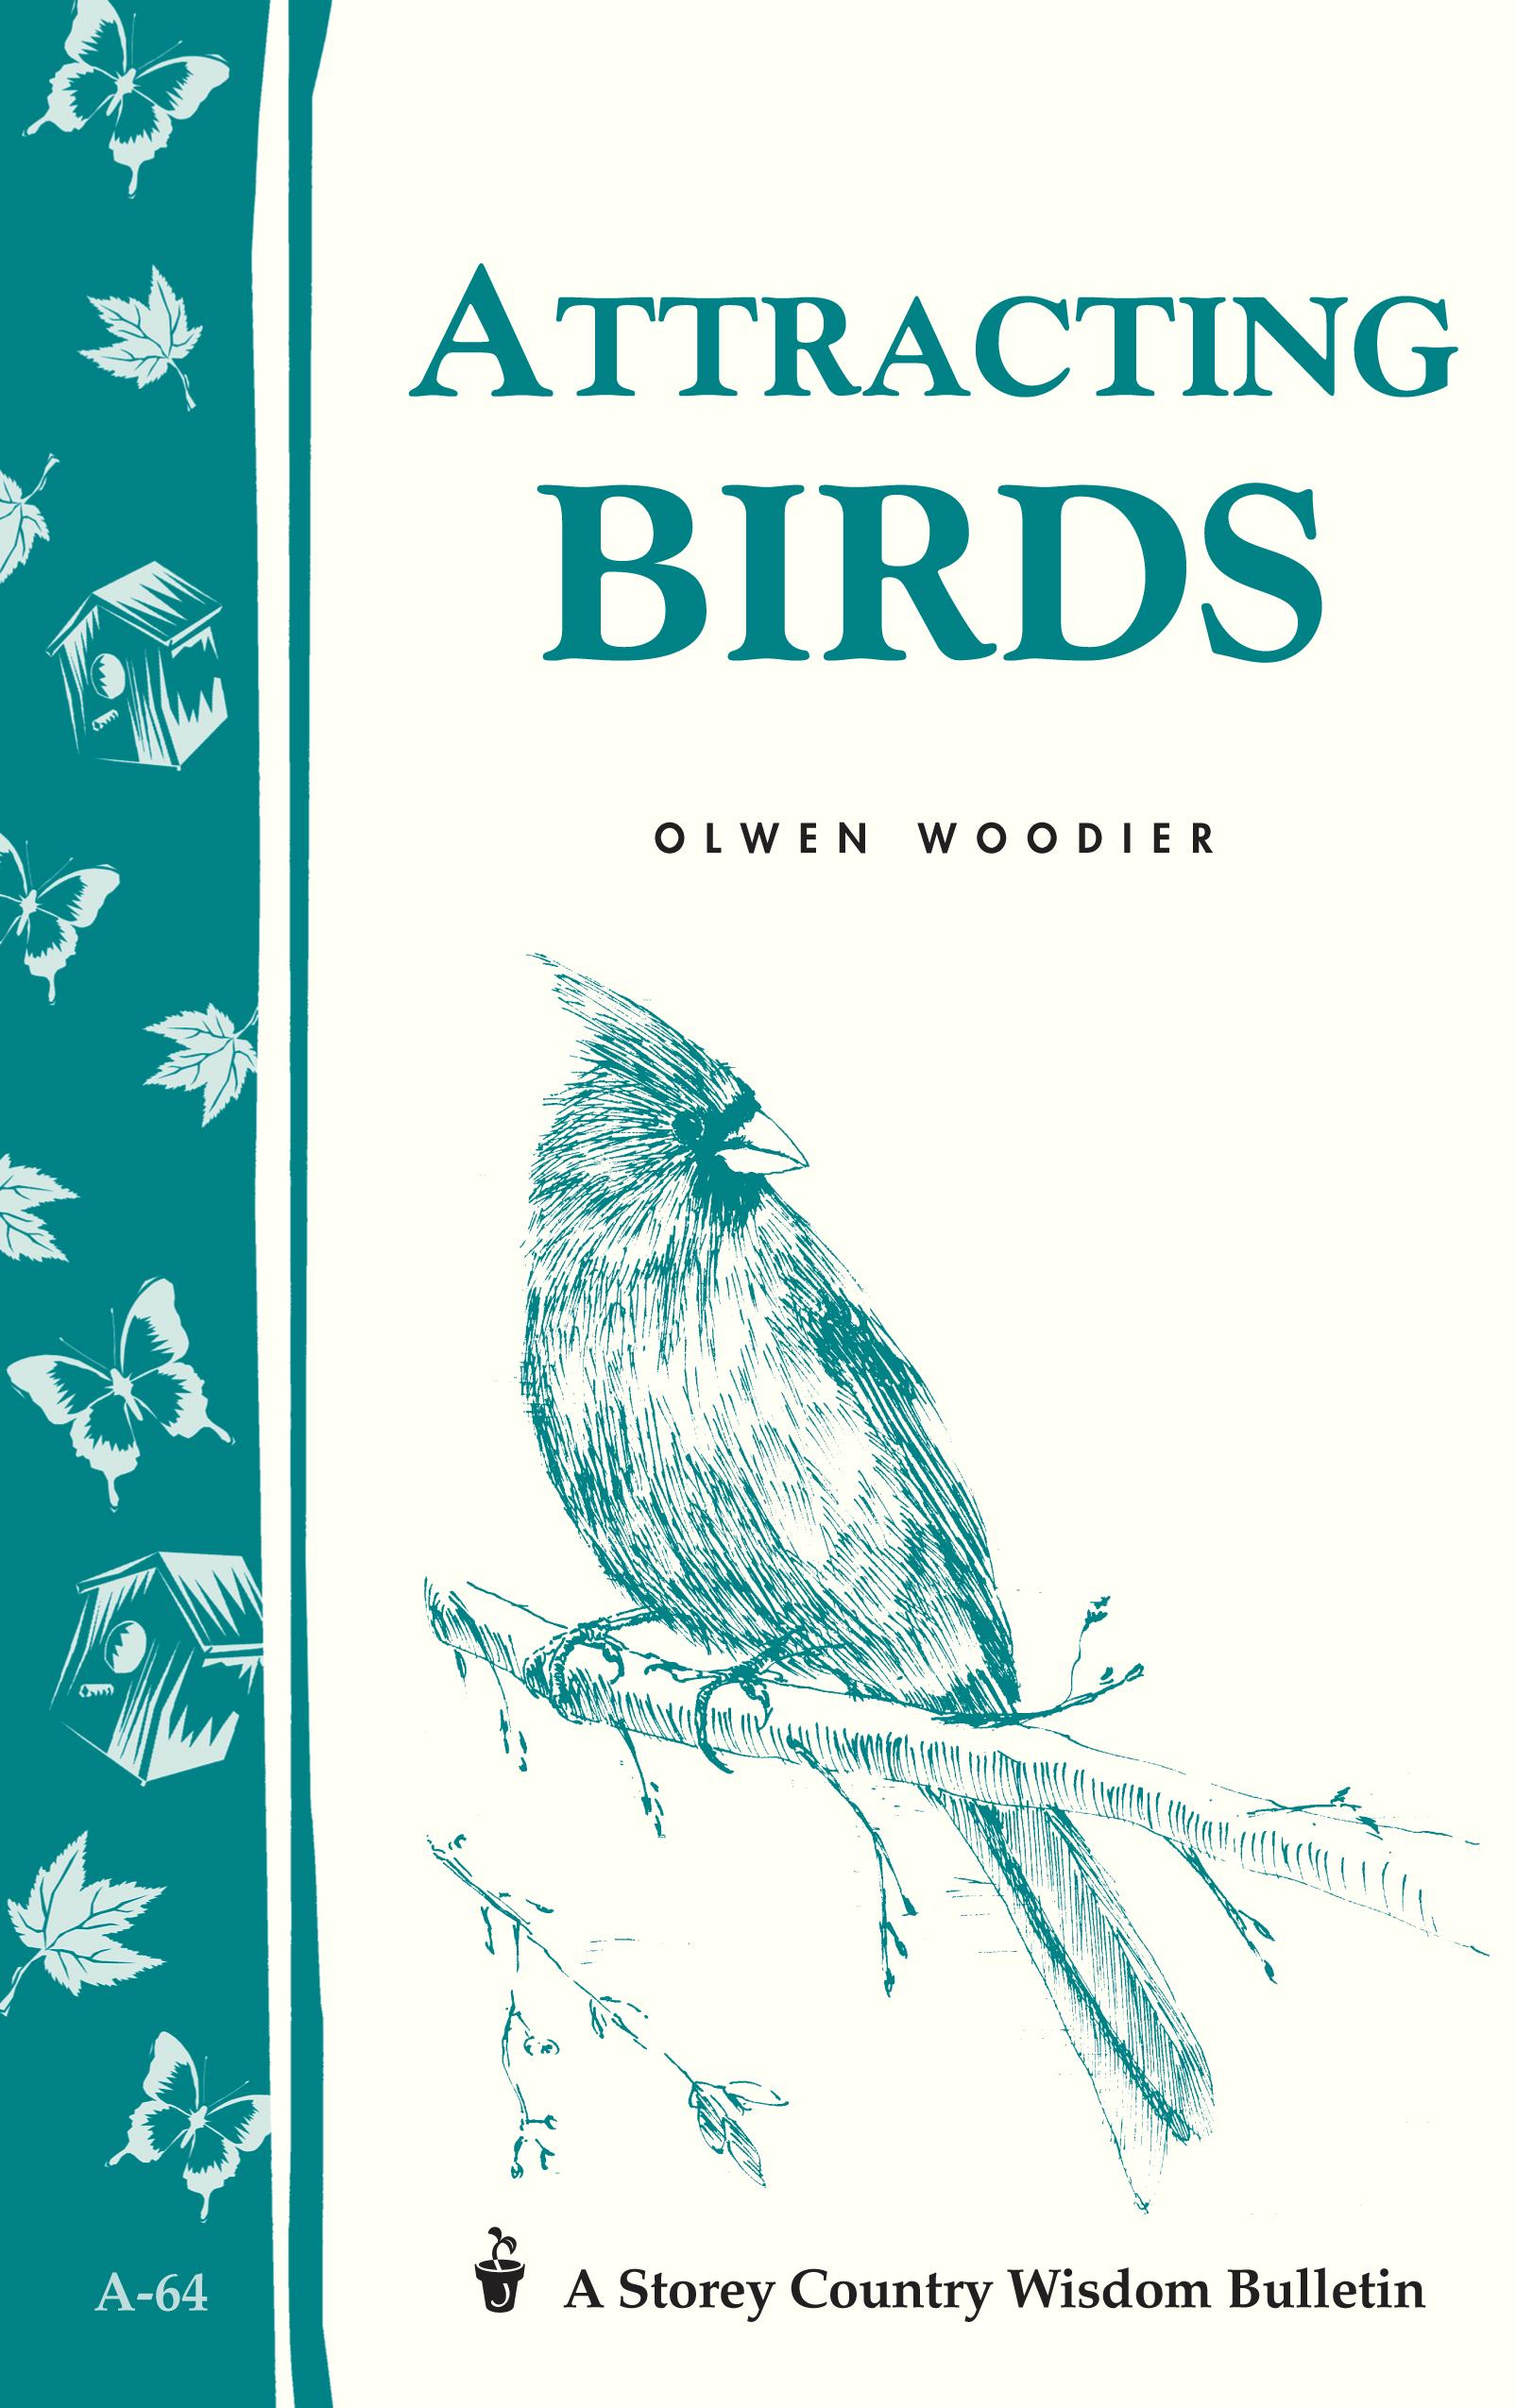 Attracting Birds Storey Country Wisdom Bulletin A-64 - Olwen Woodier